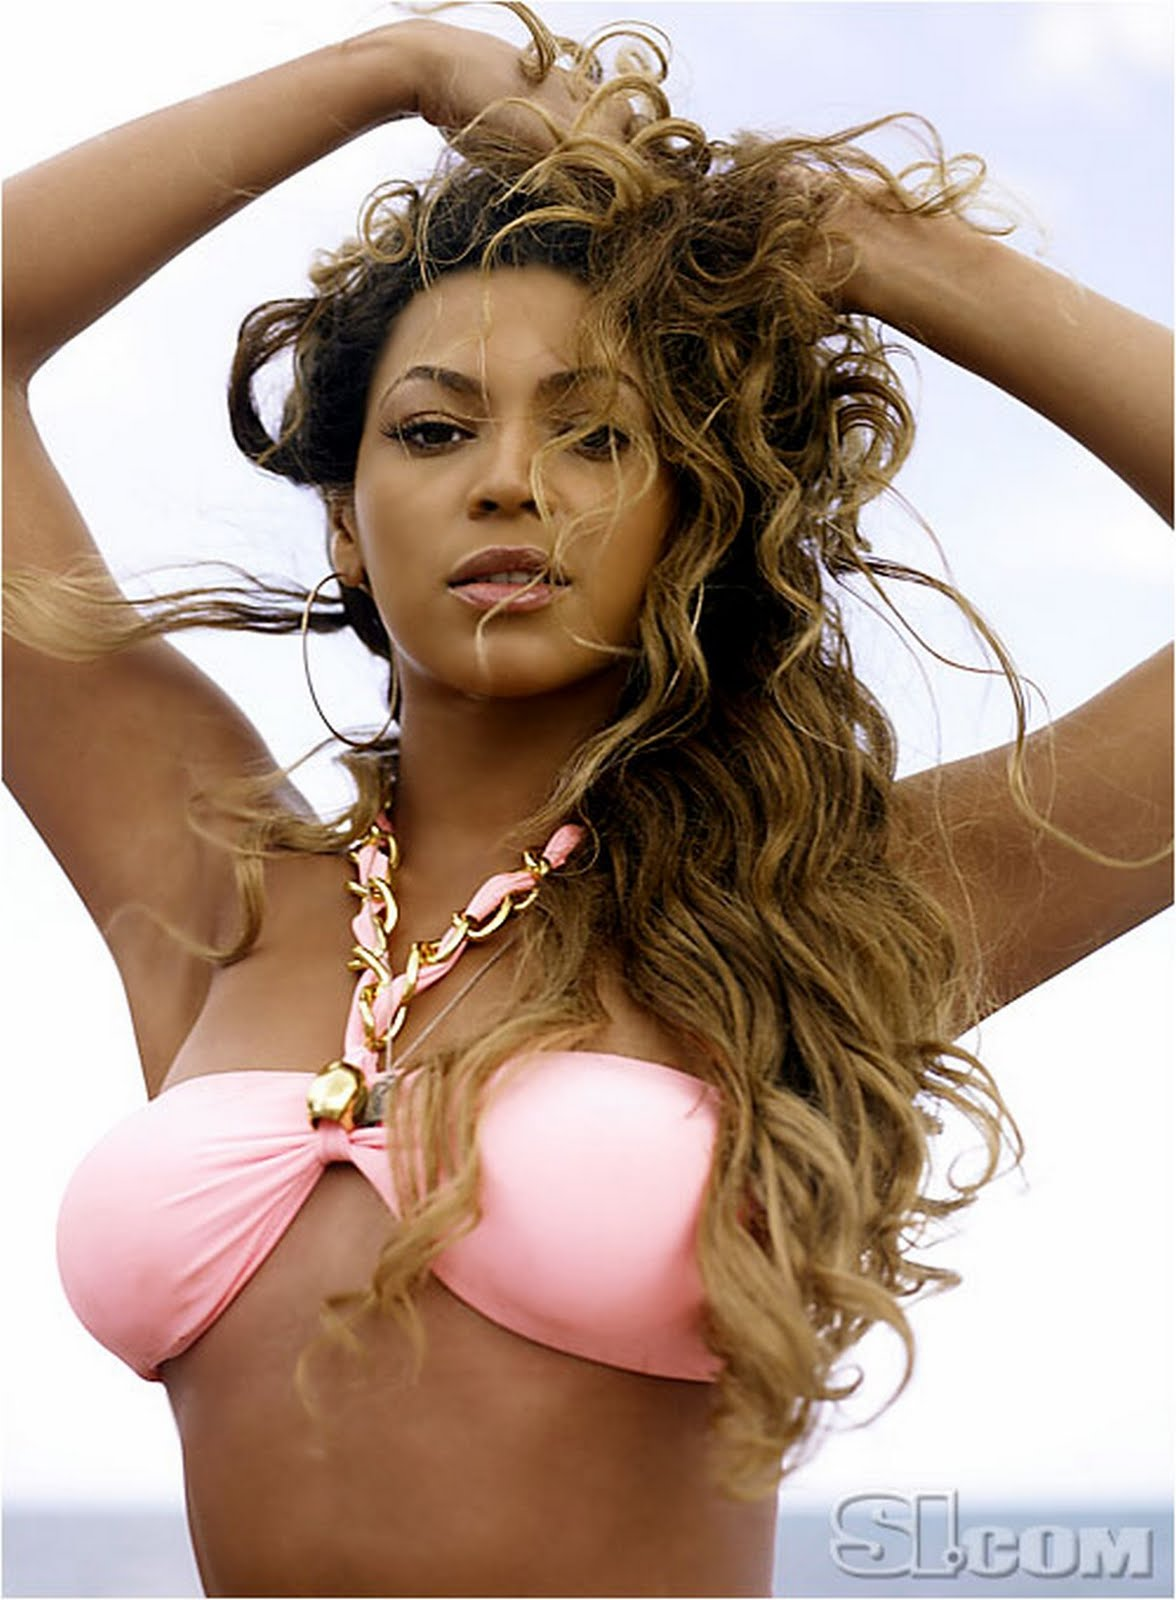 http://3.bp.blogspot.com/_9lSwJ-jeXxQ/TIwmj-A9KGI/AAAAAAAABPk/18MzNF32Okk/s1600/pink-bikini-beyonce.jpg